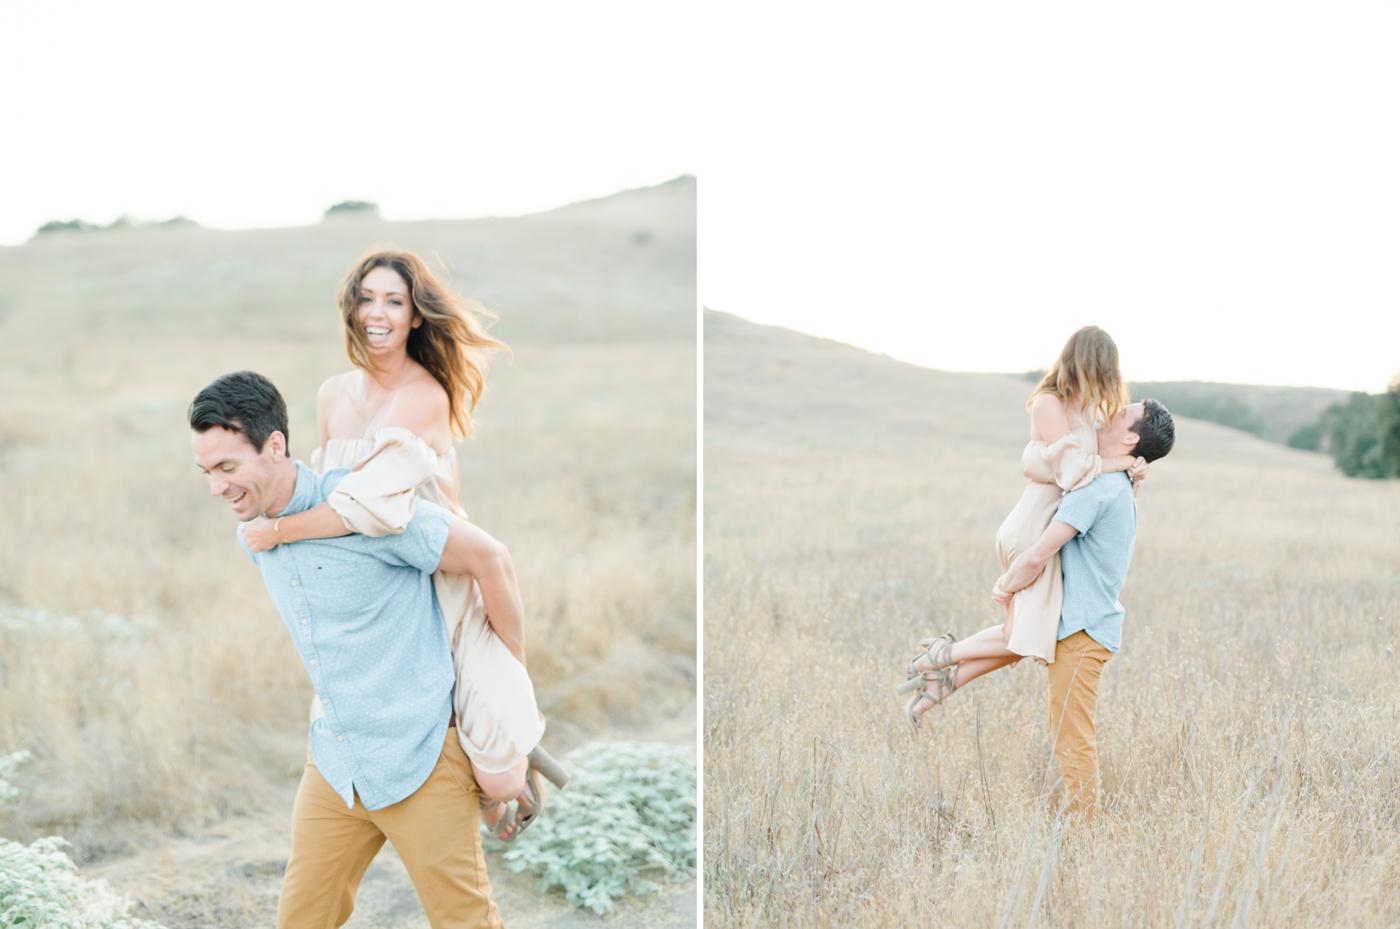 thomas riley romantic engagement session